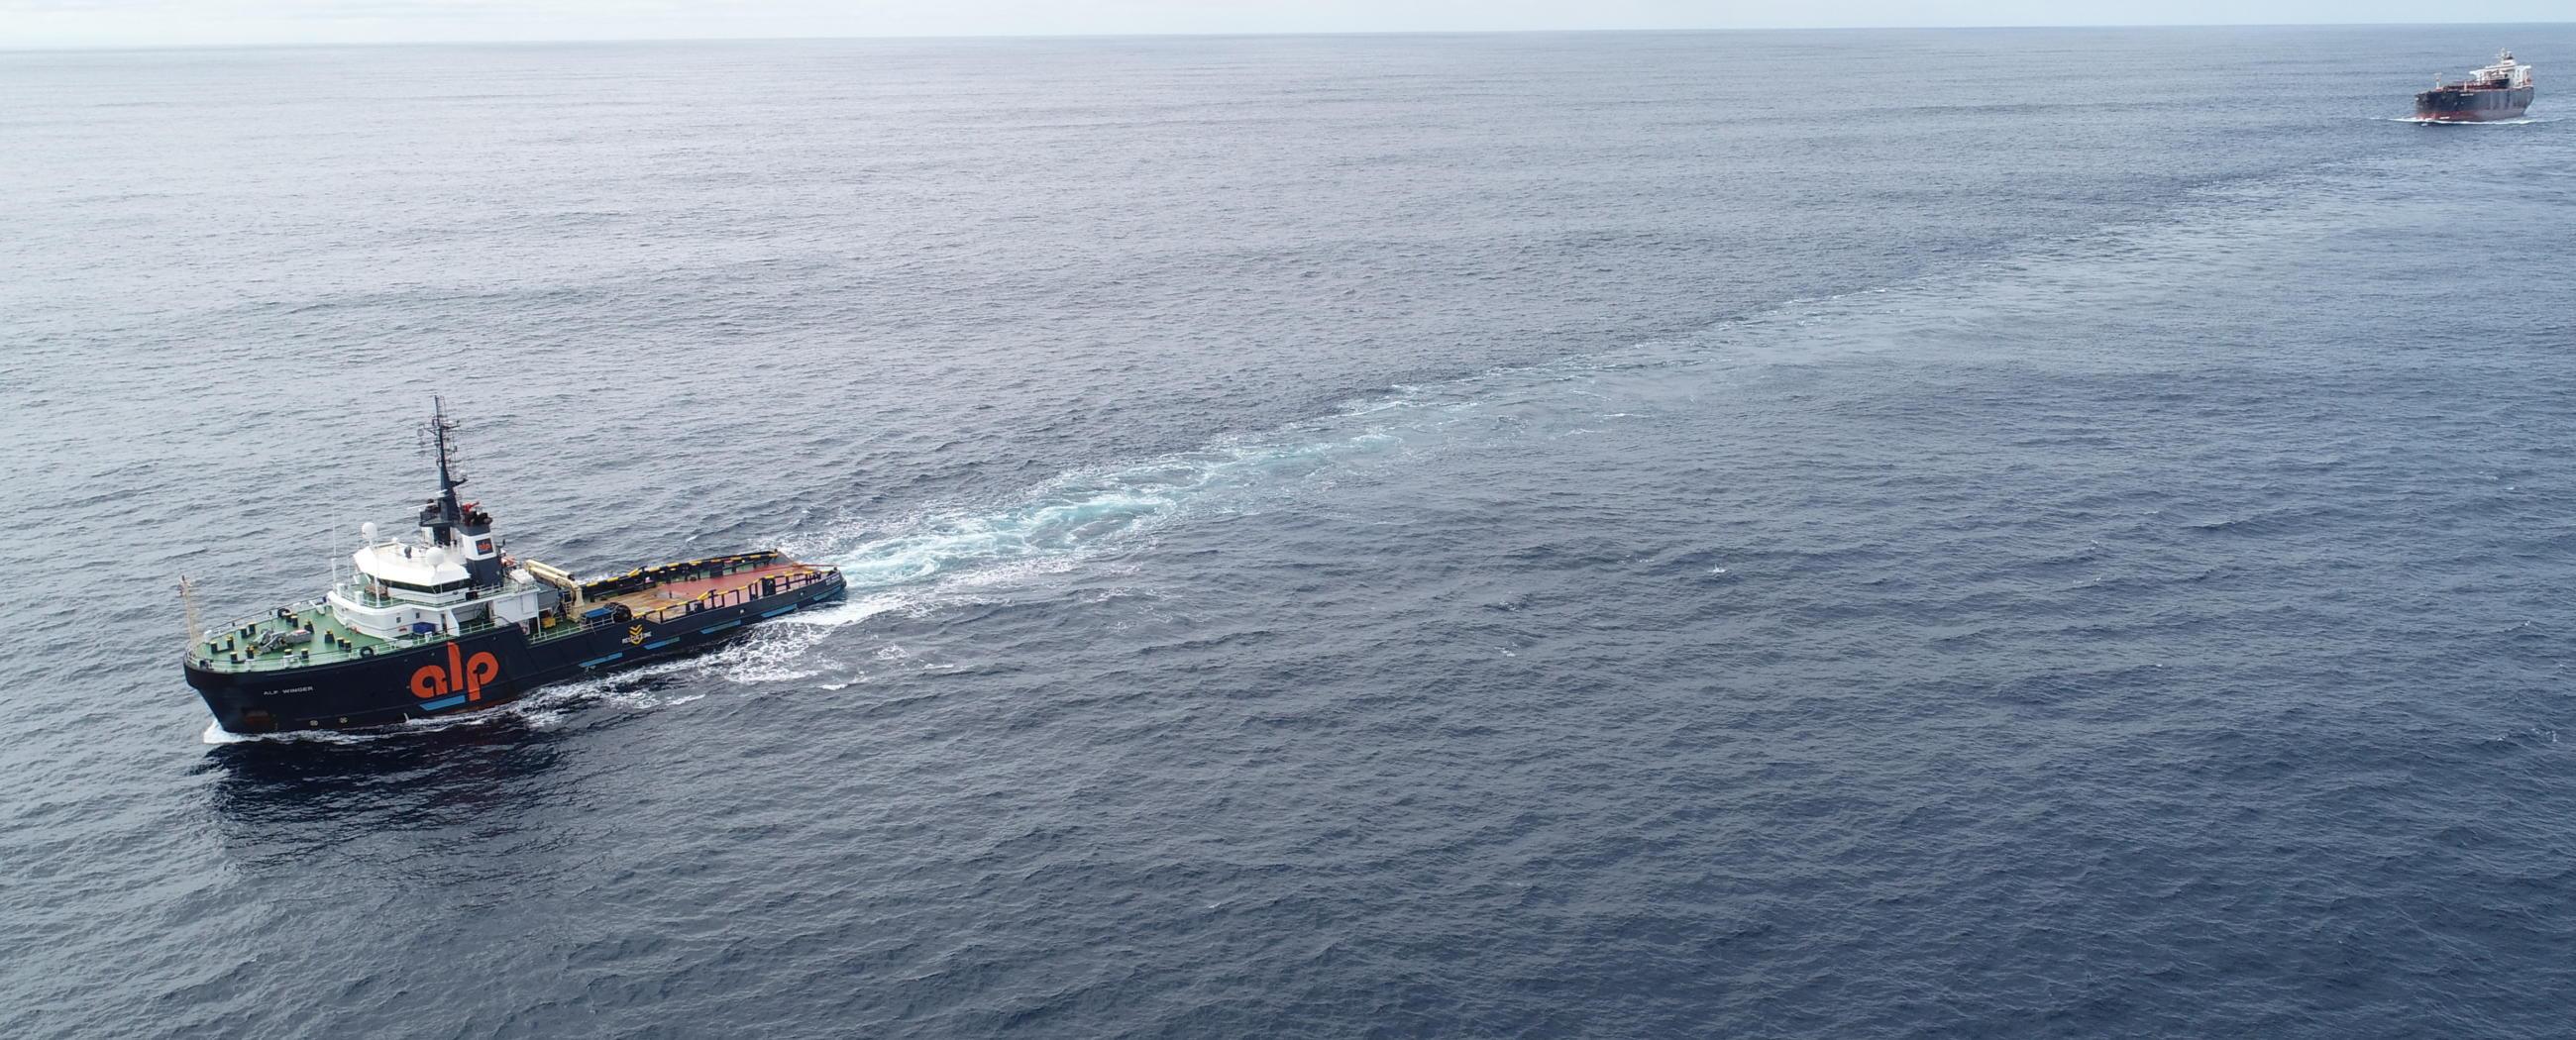 ALP-Winger-towing-MBC-Iron-chieftain-MAR19-3.JPG